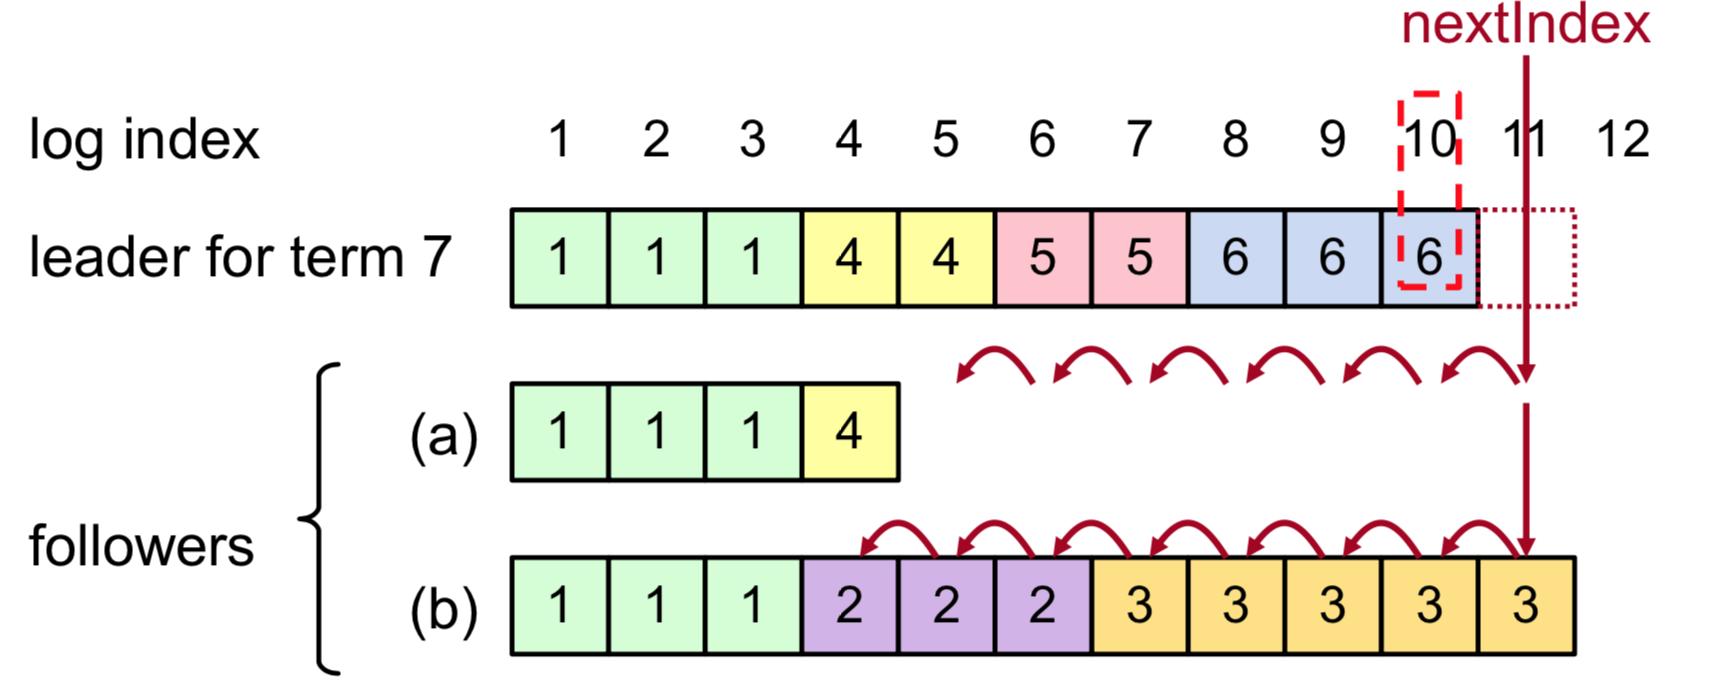 log-replication-2.png | left | 400x150